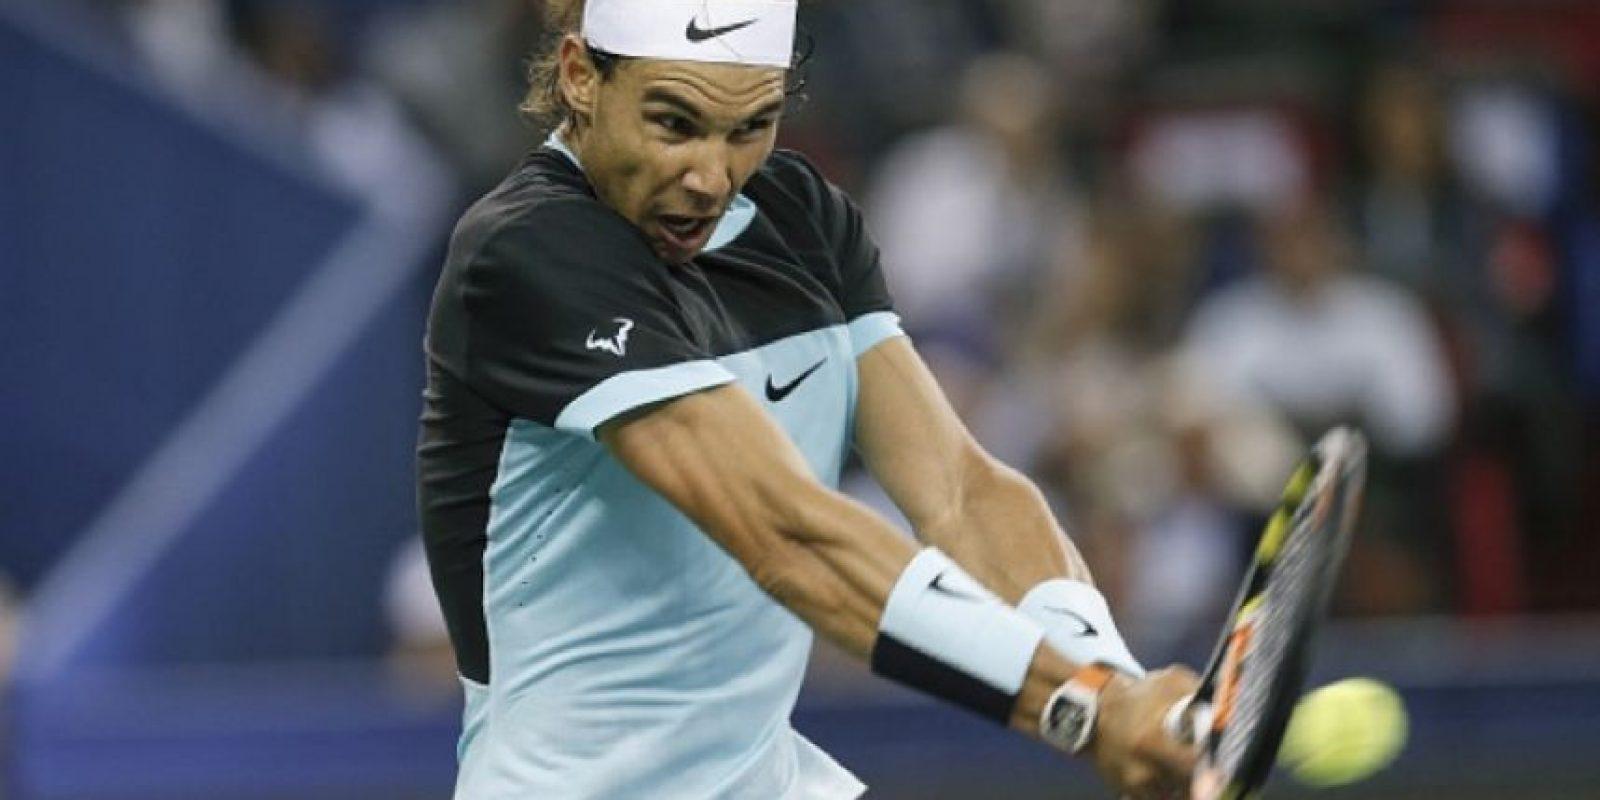 El tenista español Rafael Nadal. Foto:Getty Images